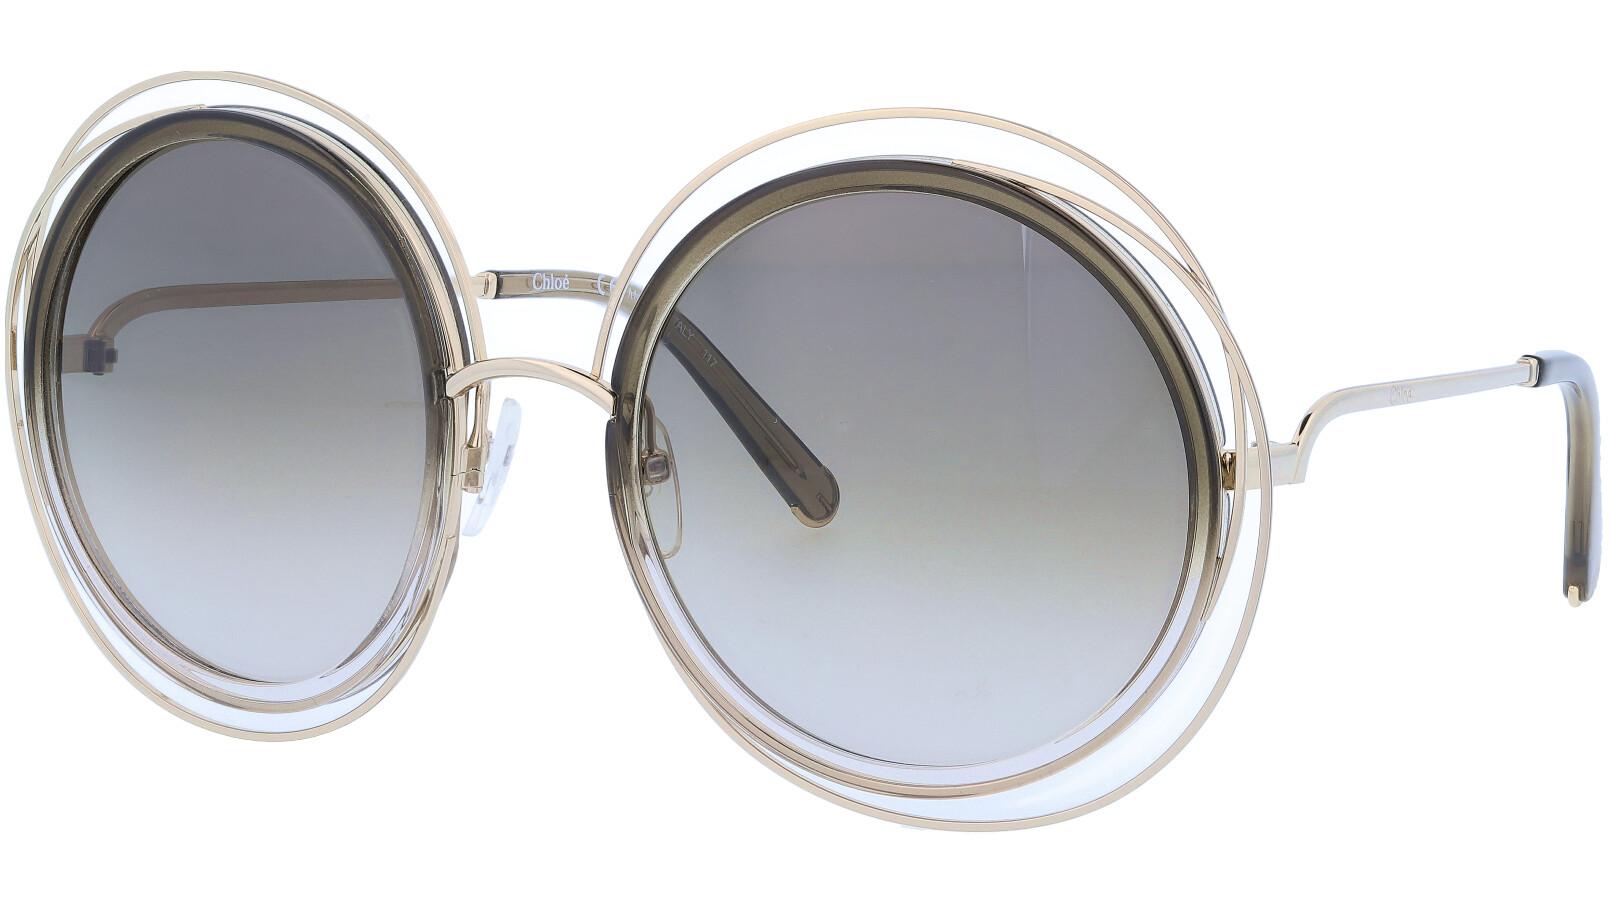 CHLOE CE120SD 724 58 Gold Carlina Round Full Rim Sunglasses